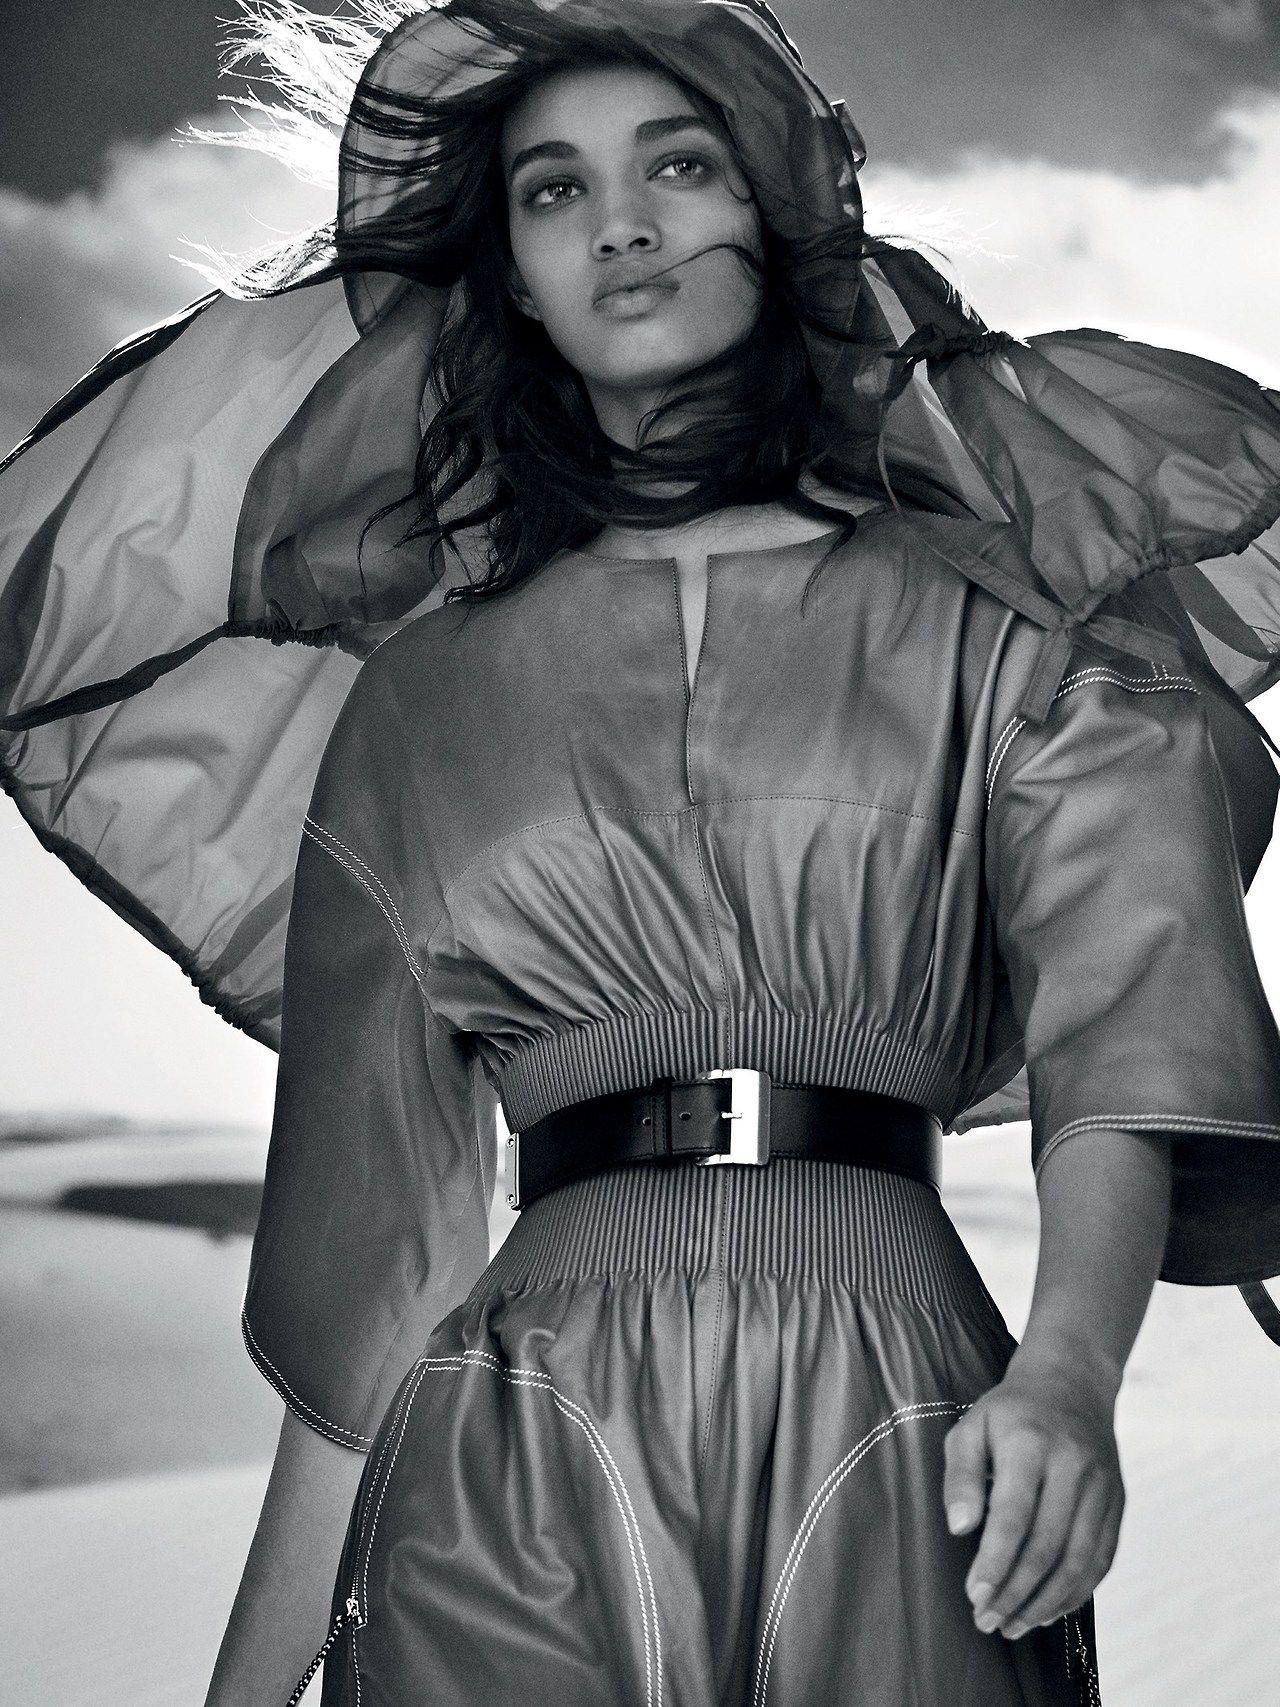 Wearesodroee Wind In Your Favor Publication Vogue Brazil April 2017 Model Ellen Rosa Photographer Giampaolo Sgura Fashion Editor Pedro Sales Hair